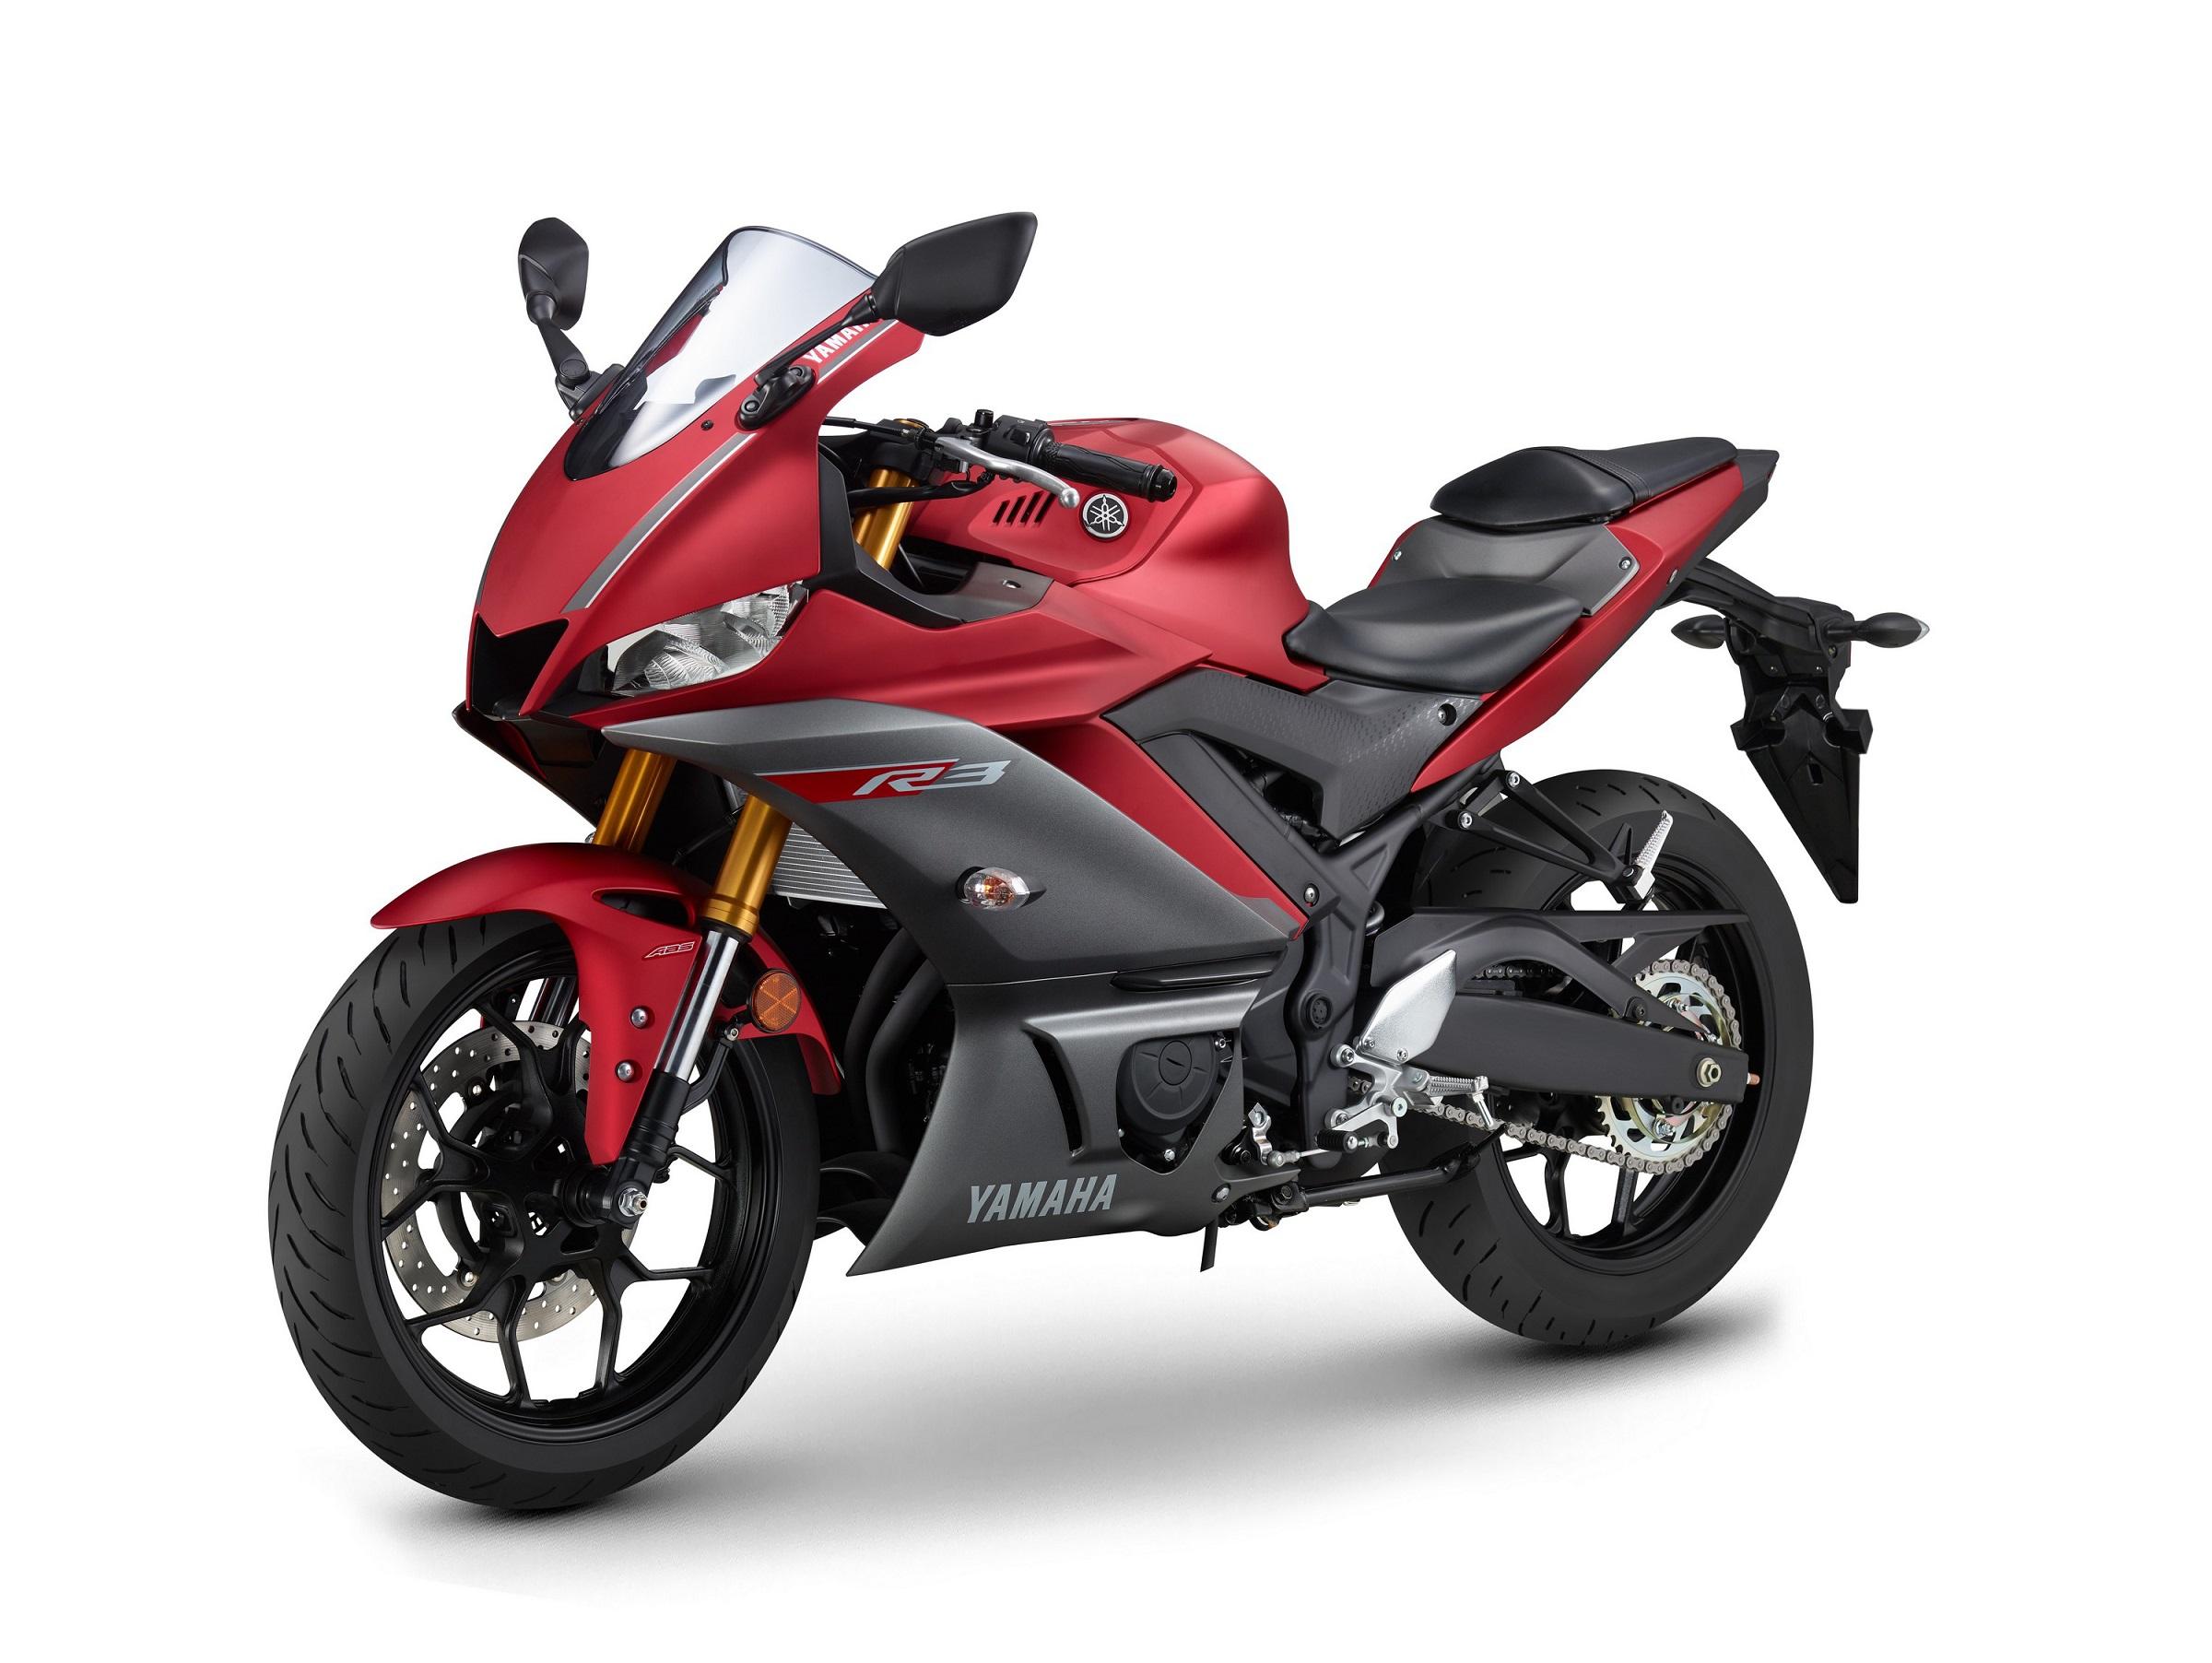 2019 Yamaha R3 Red Sports Bike Bowral 3